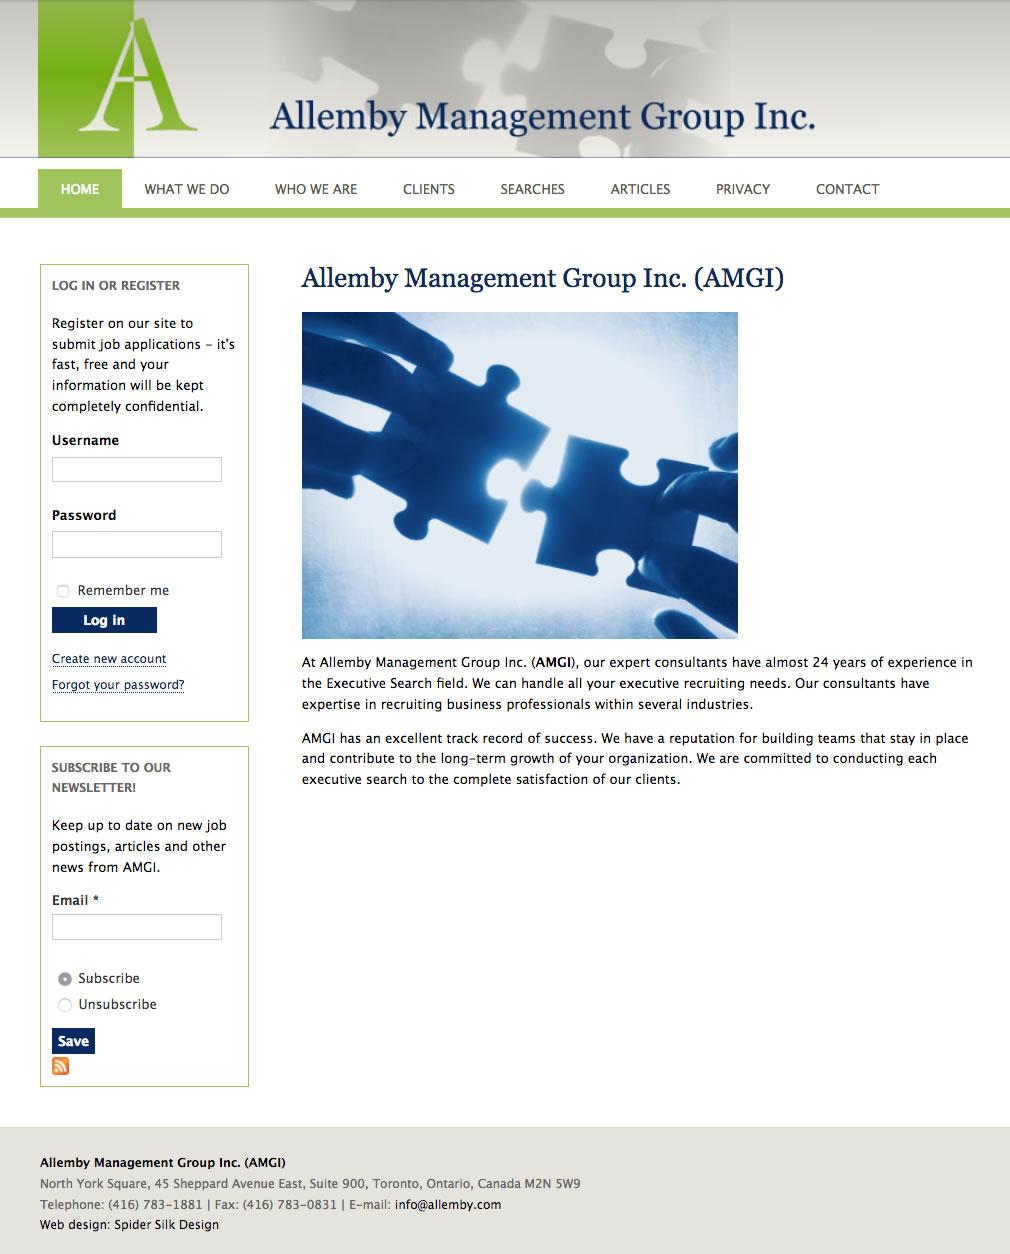 AMGI web site screenshot